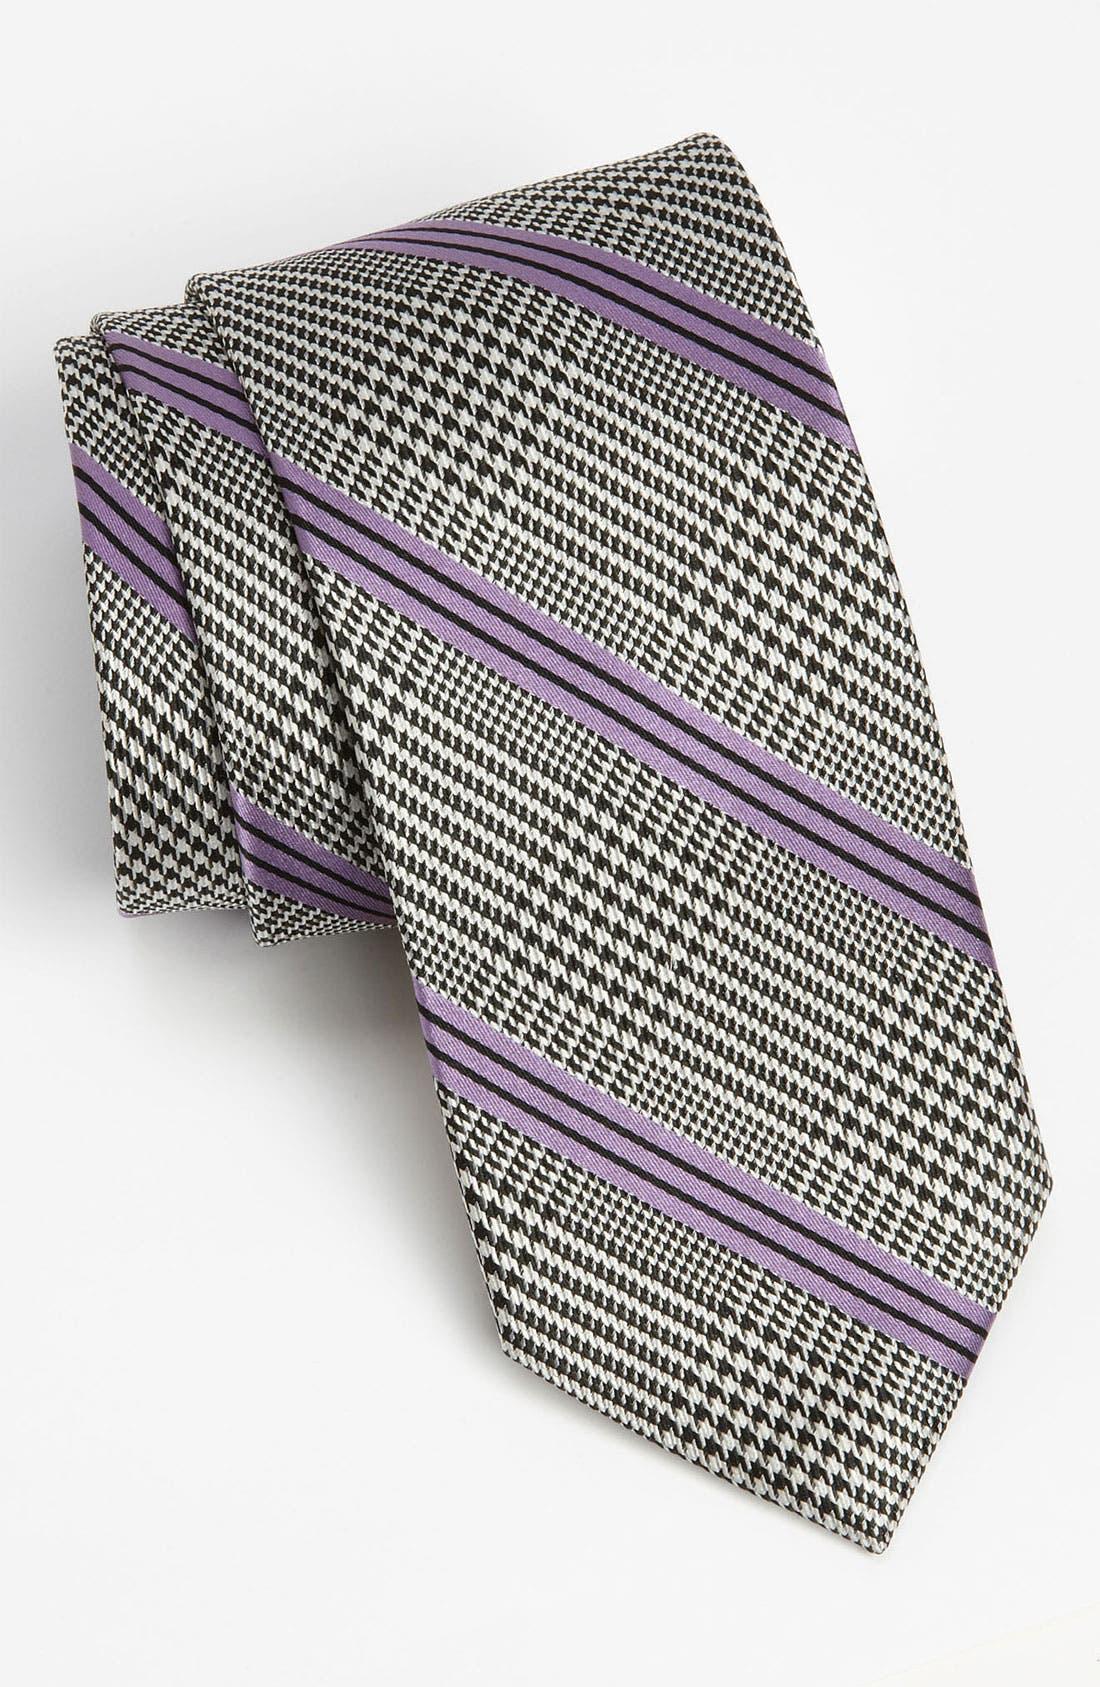 Alternate Image 1 Selected - Peter Millar Woven Silk Tie